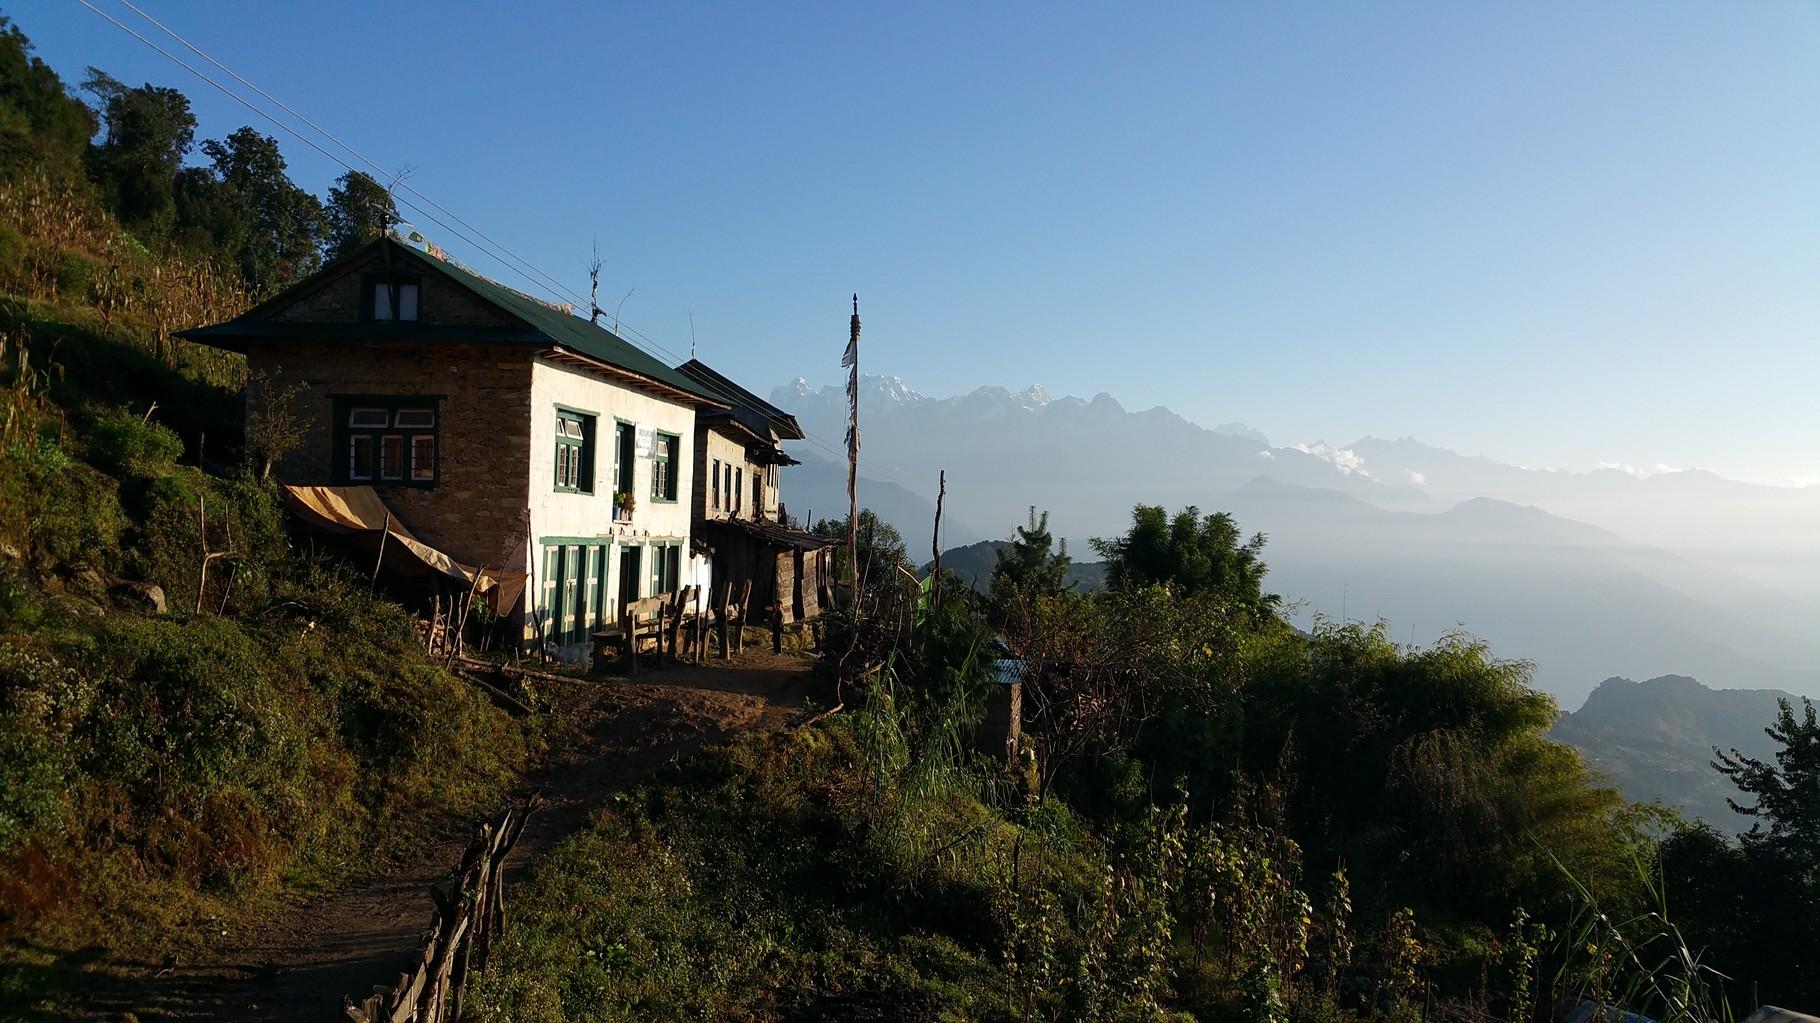 Petits villages sur le départ Phaplu http://www.shangrila-trek.com/trek-peak-mera/